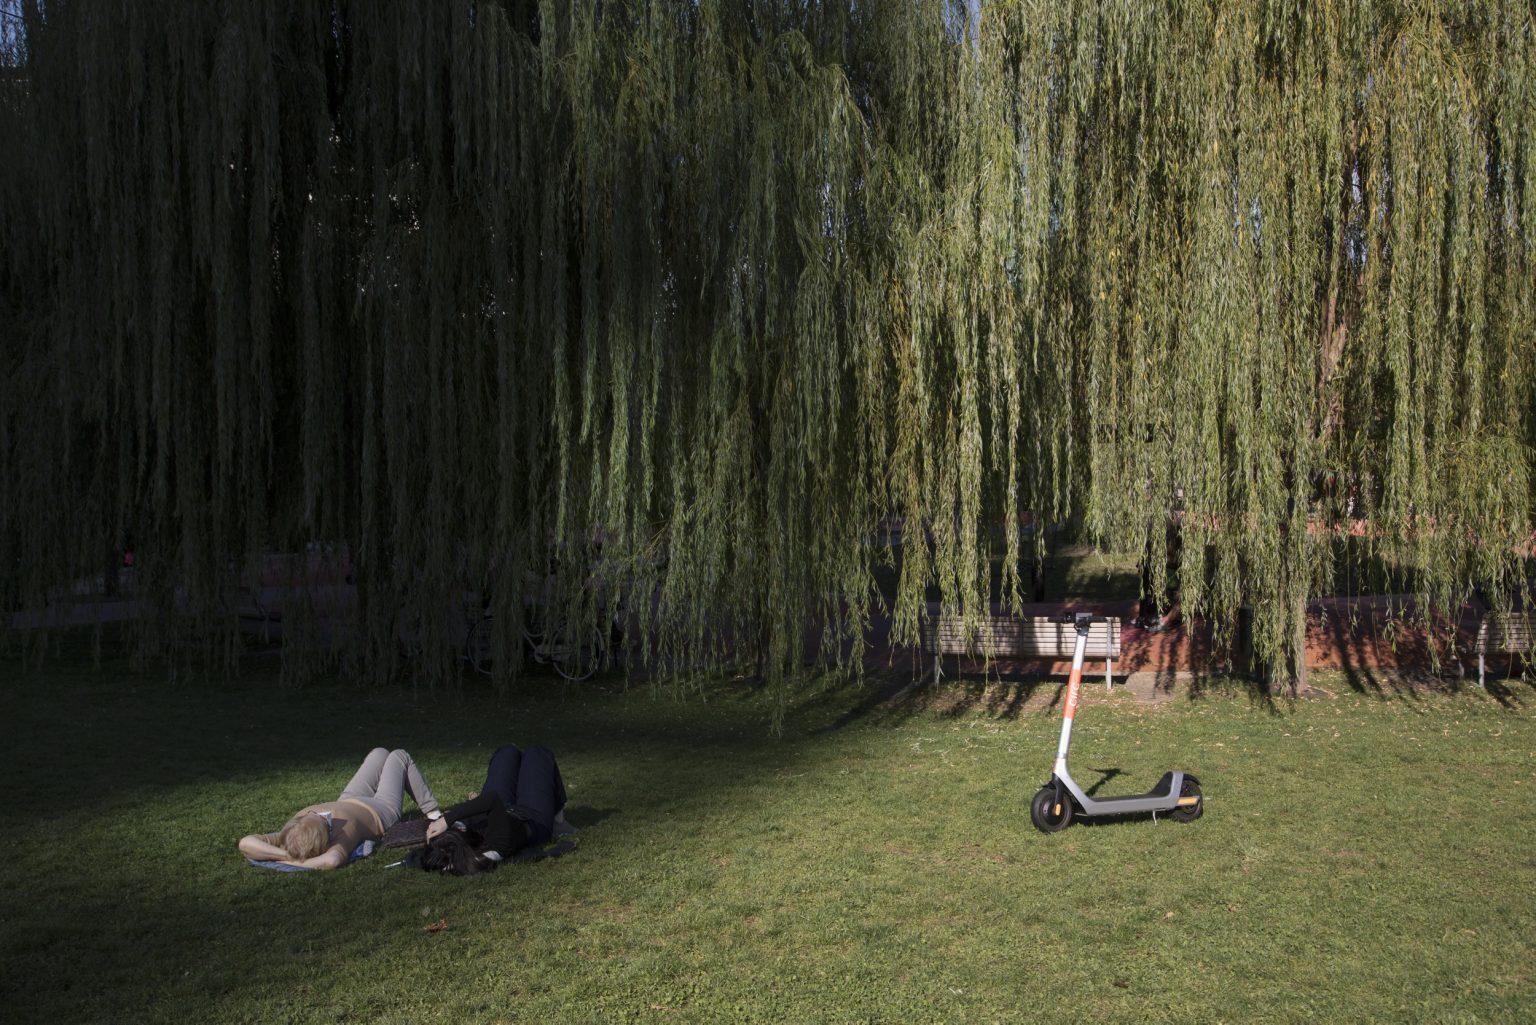 parco-biblioteca-degli-alberi-milanopark-tree-library-milan